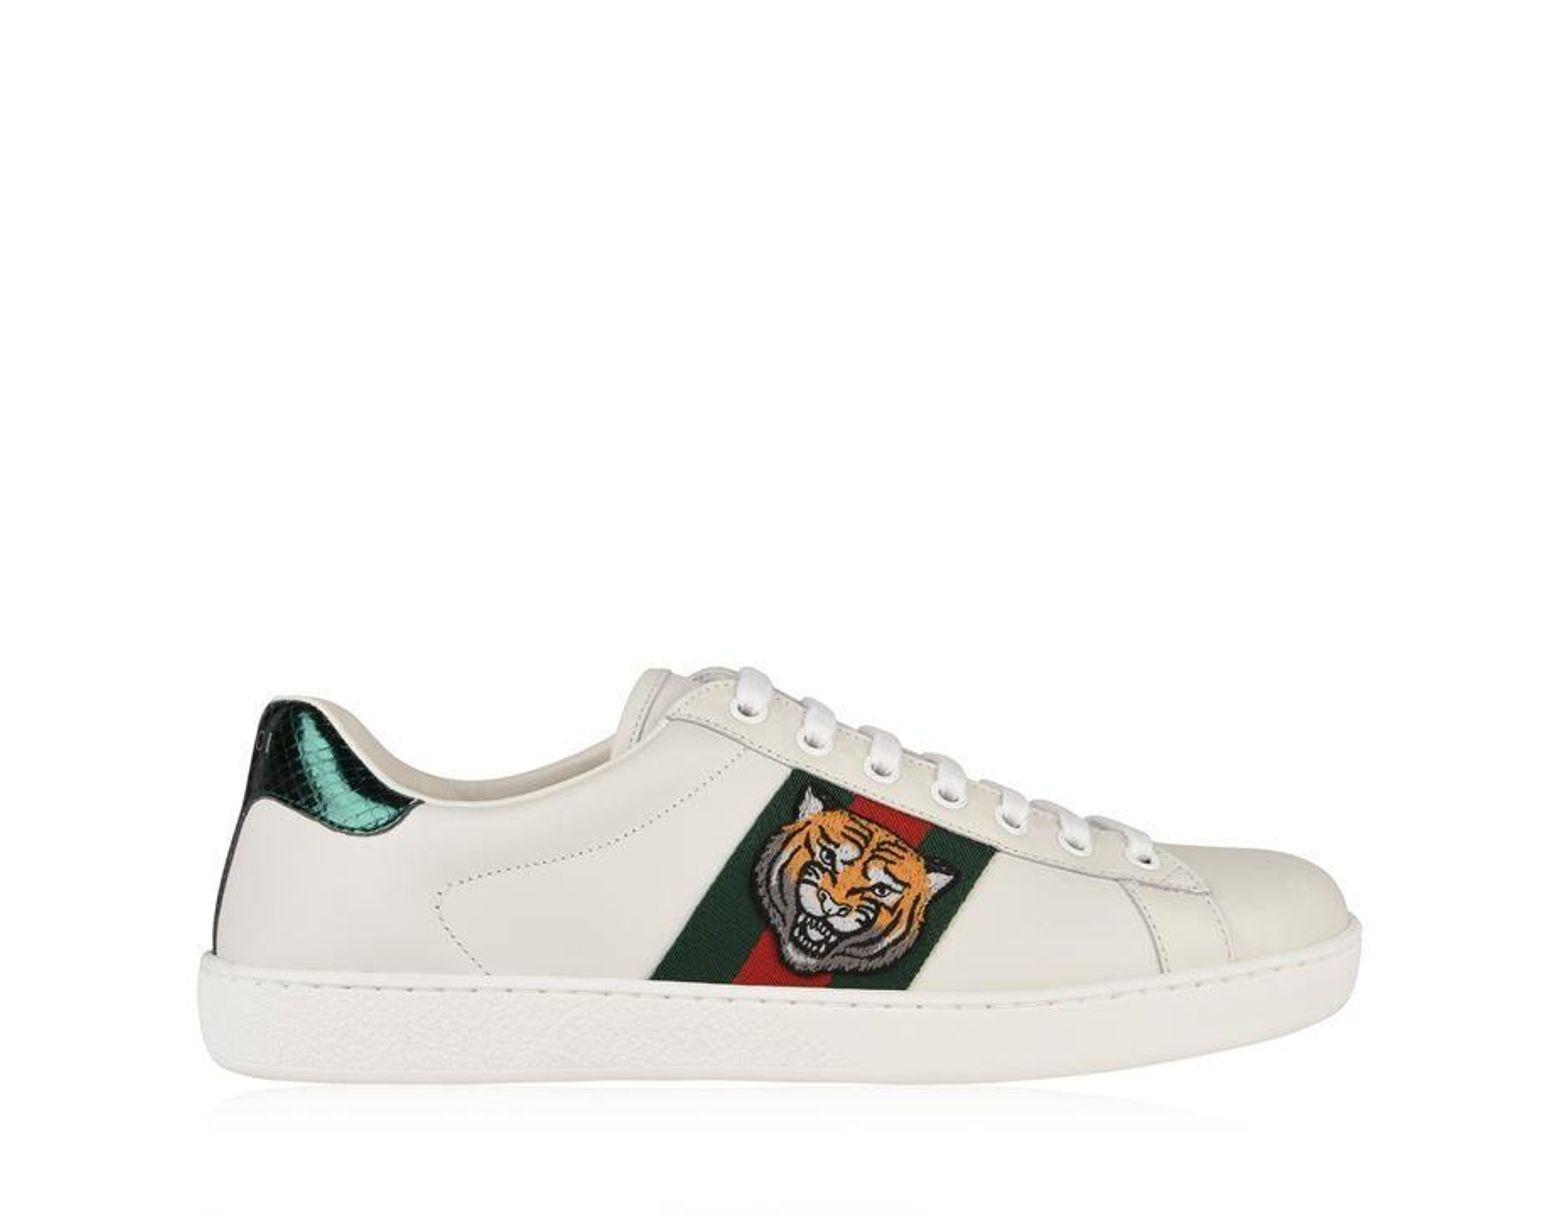 91d63772 Men's Ace Tiger Web Sneakers